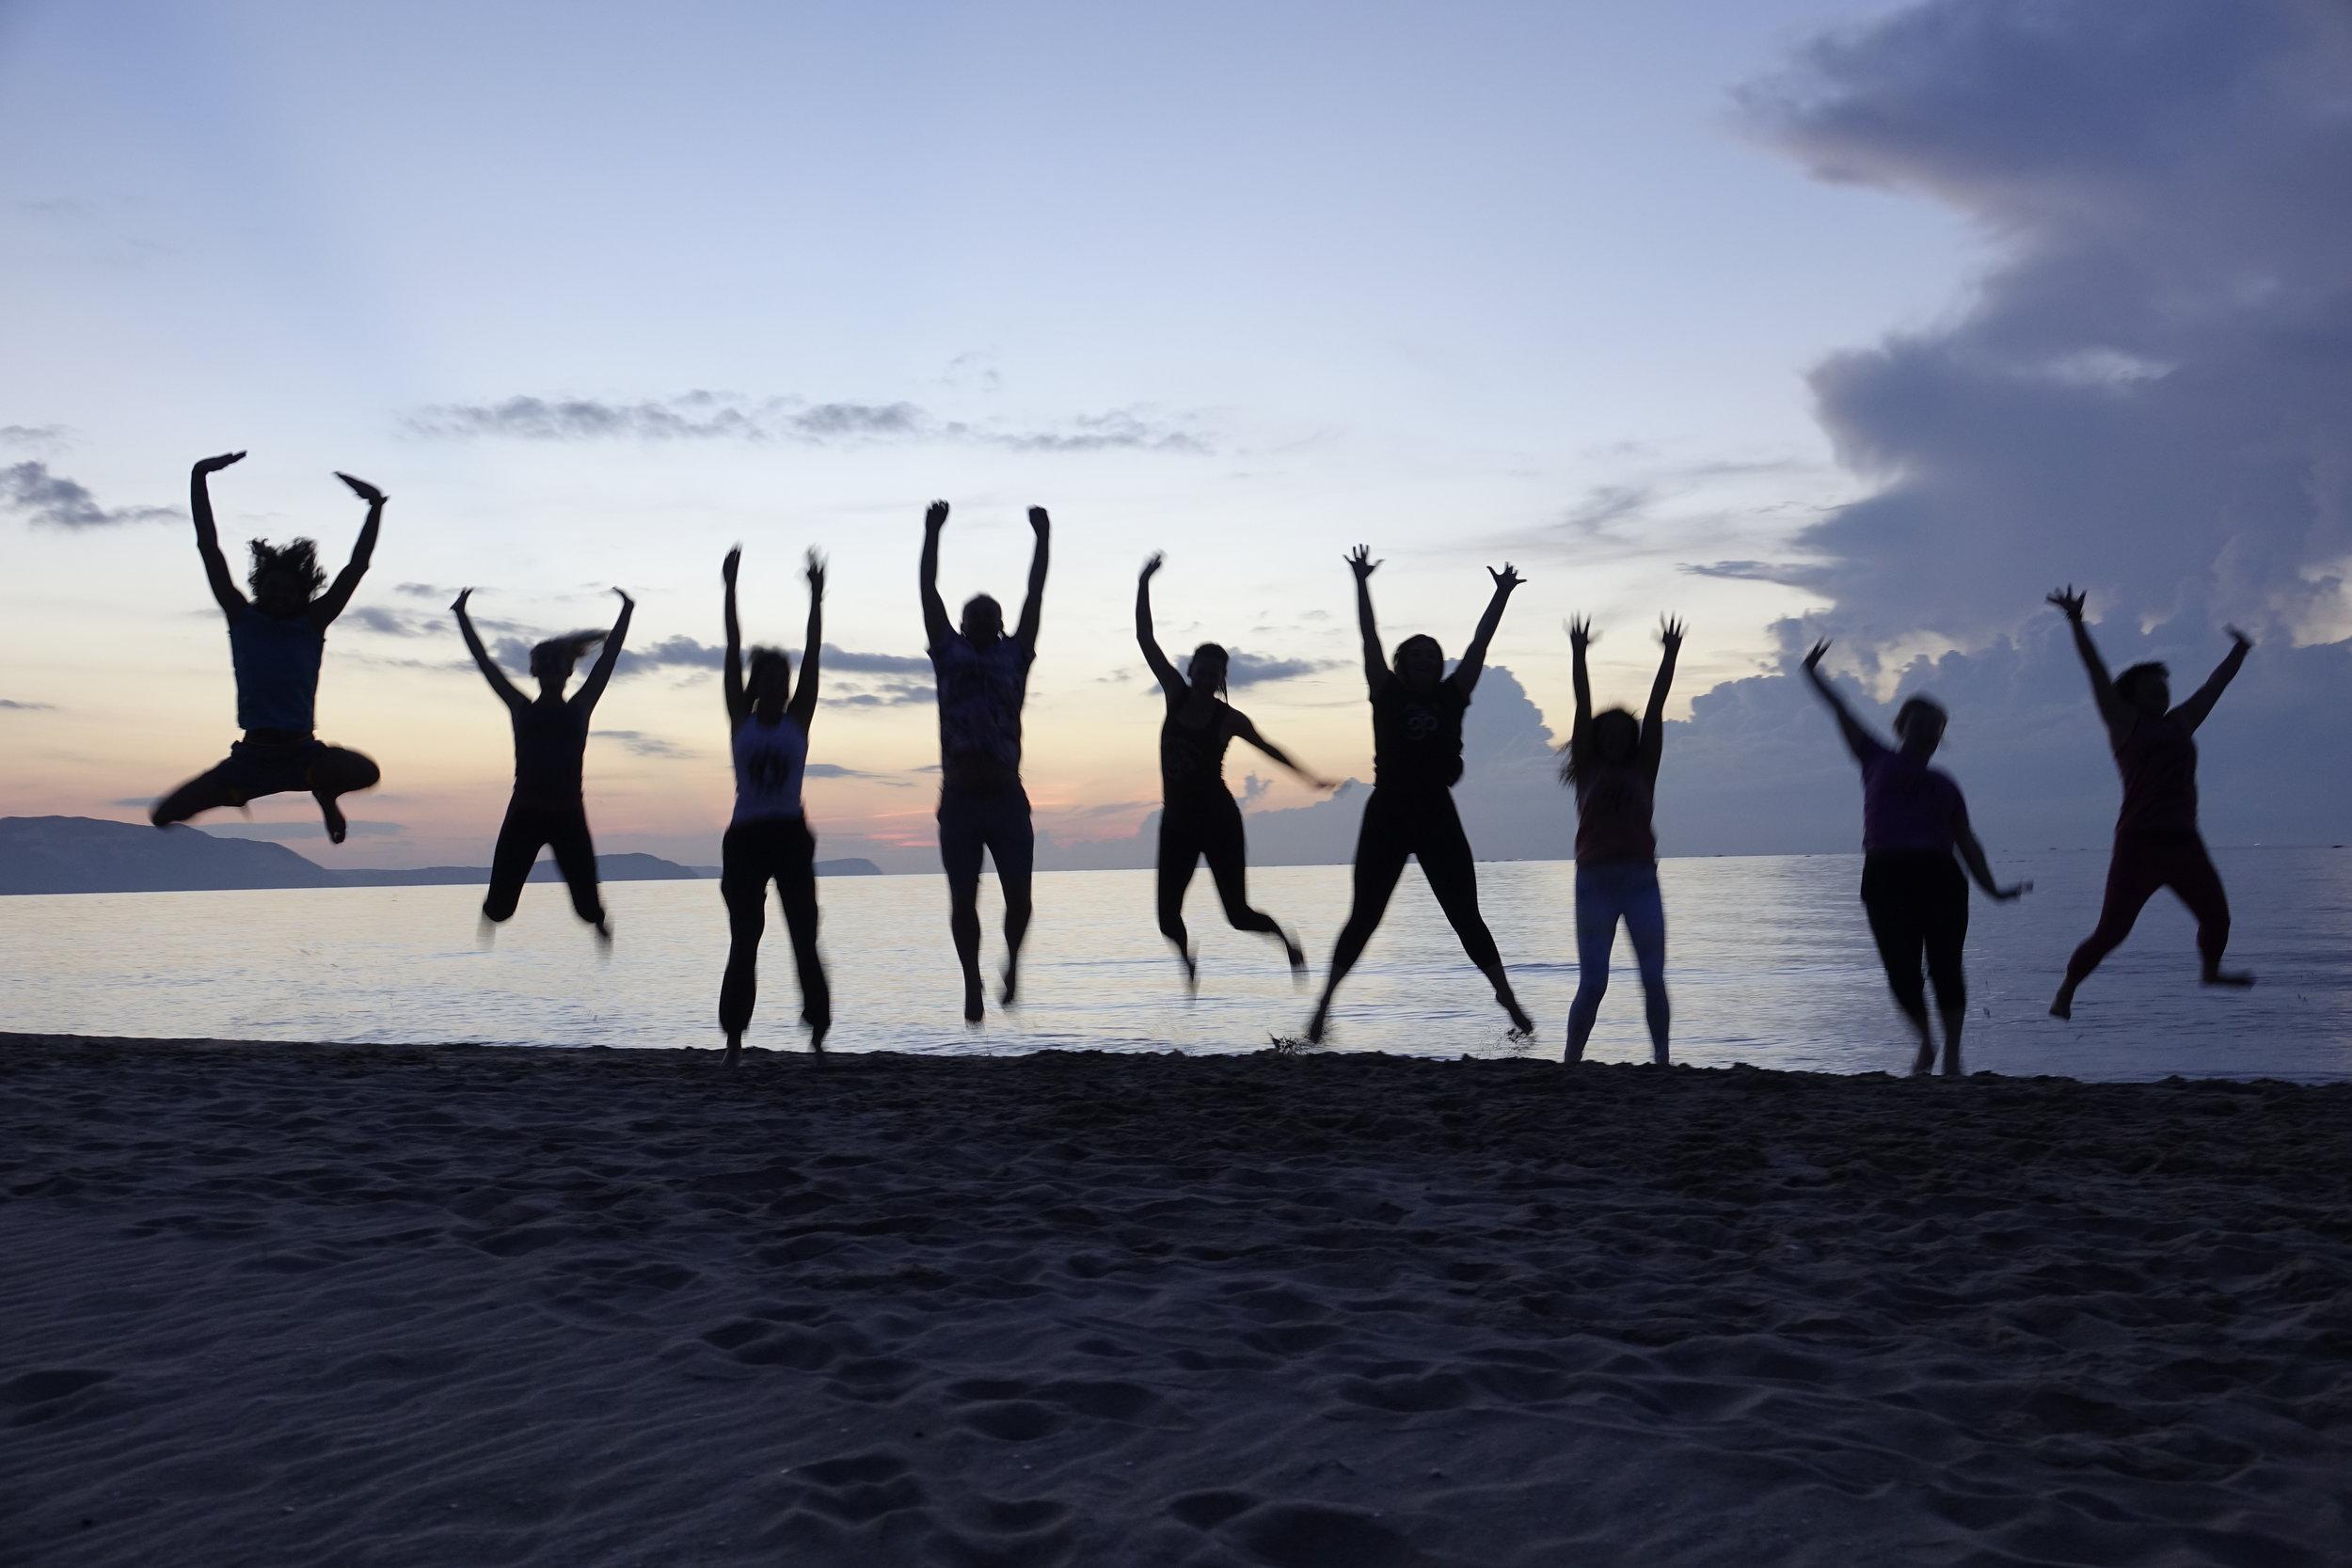 200-hour-yoga-teacher-training-mindfulness-mui-ne-vietnam